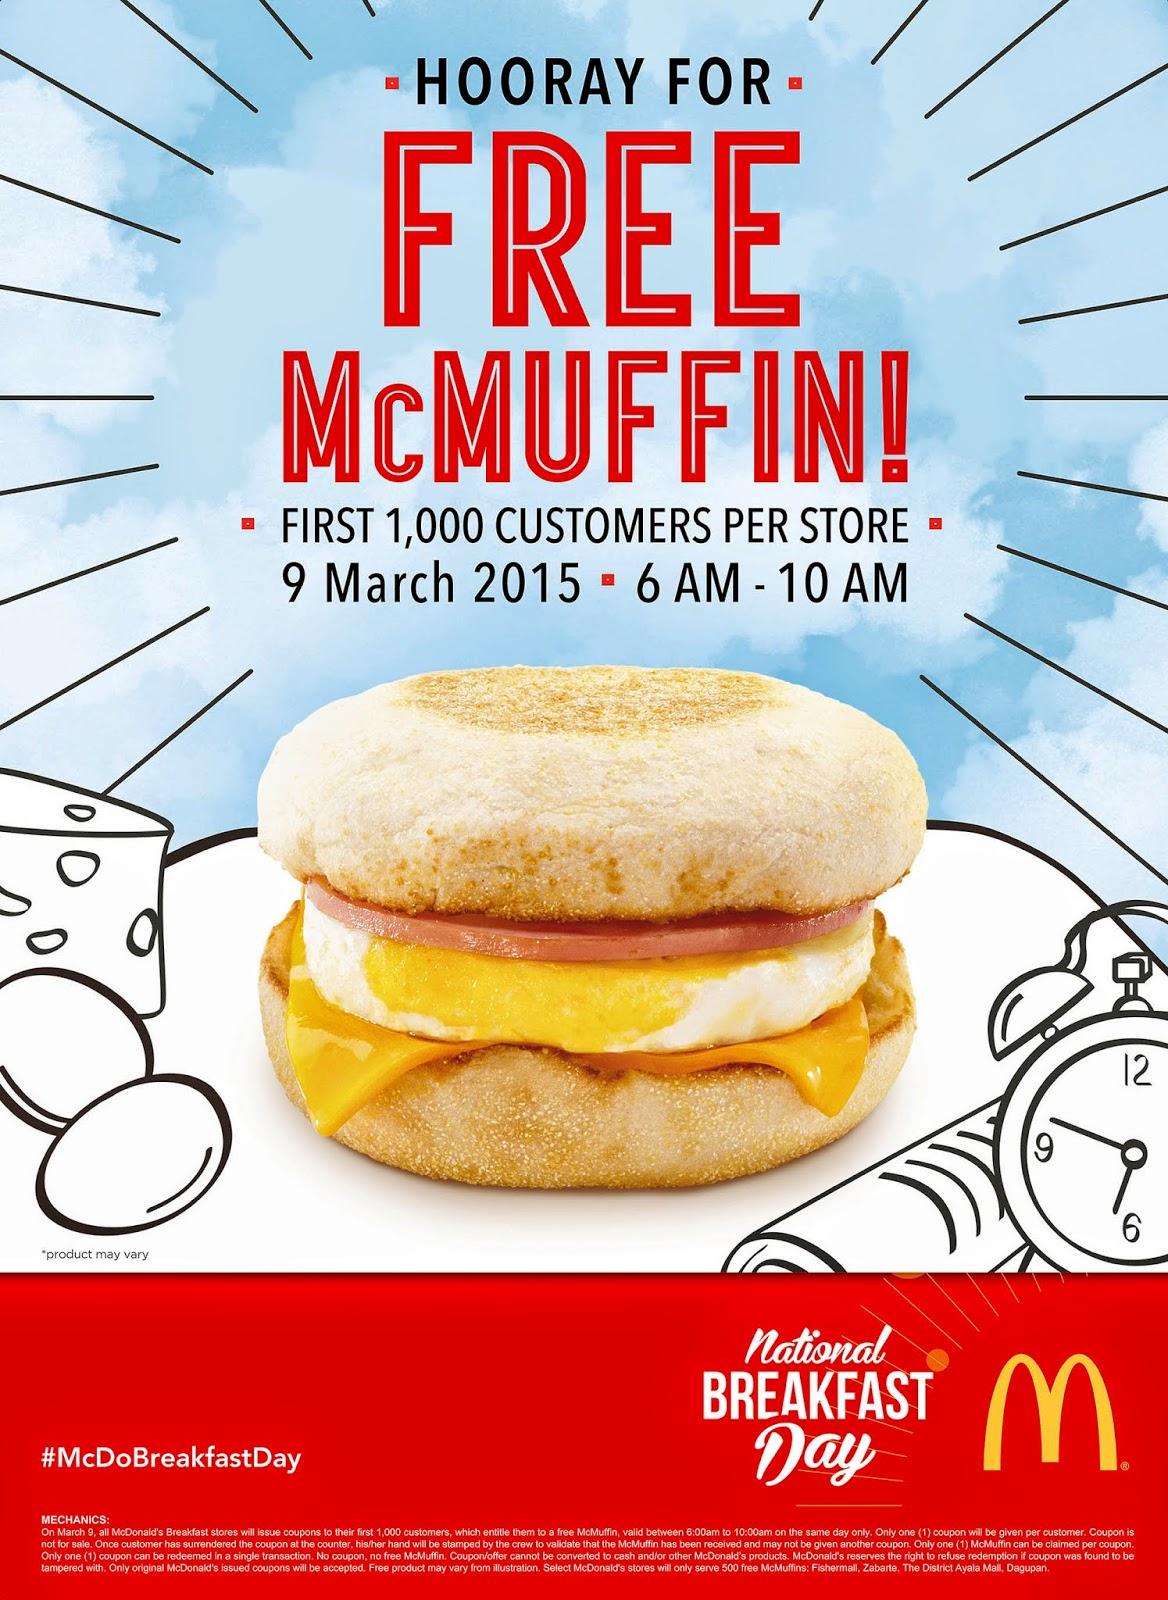 mcdonalds national breakfast day - HD1168×1600